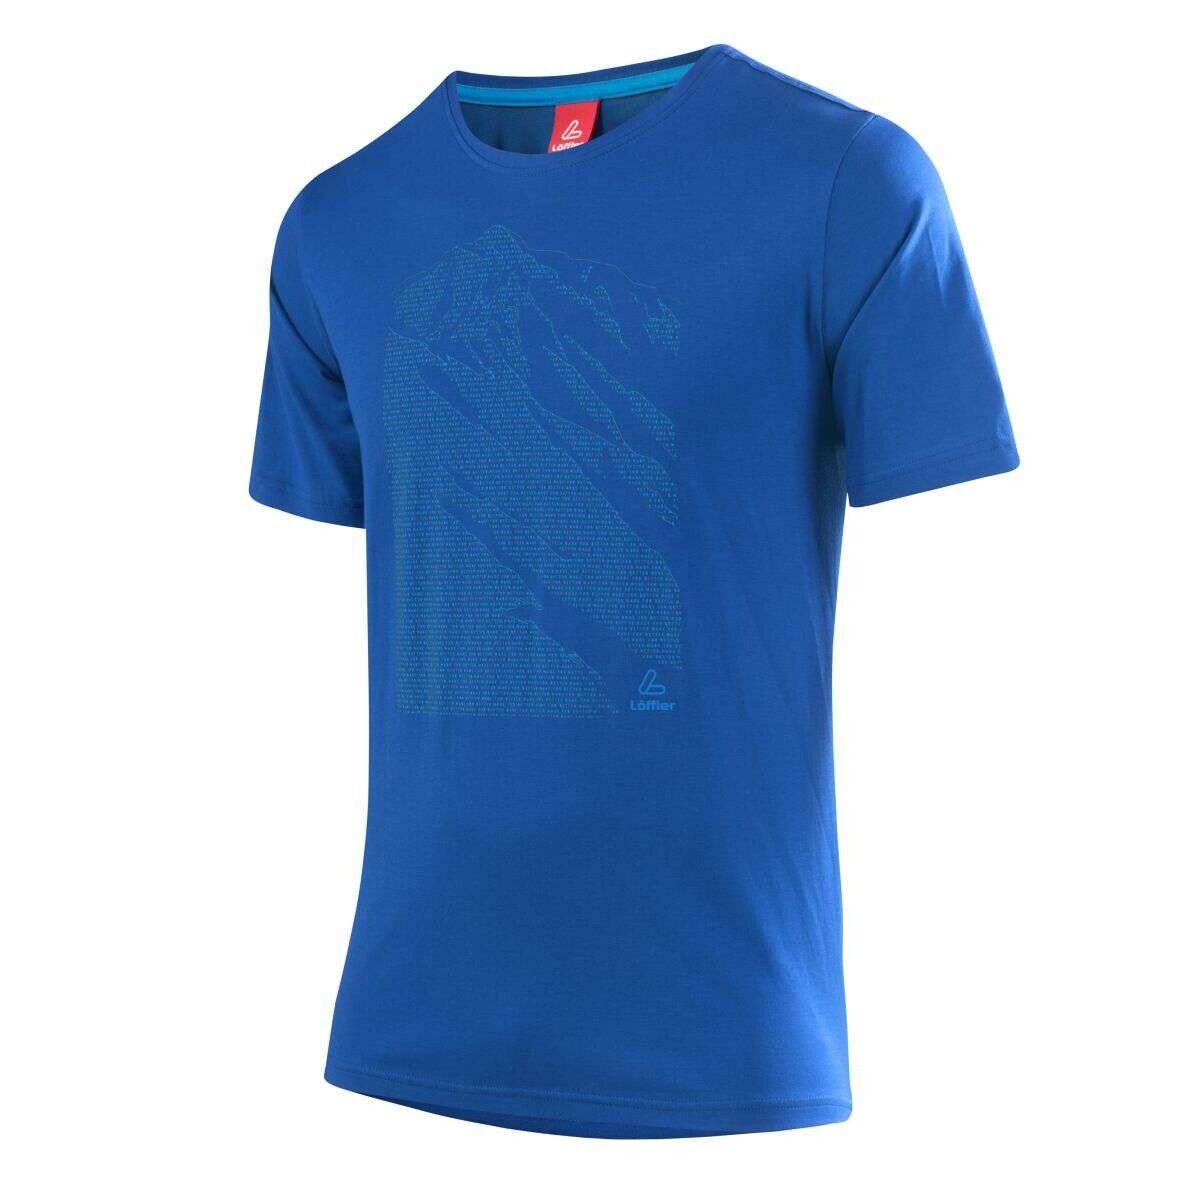 Löffler Printshirt Transtex Single Funktionsshirt blue